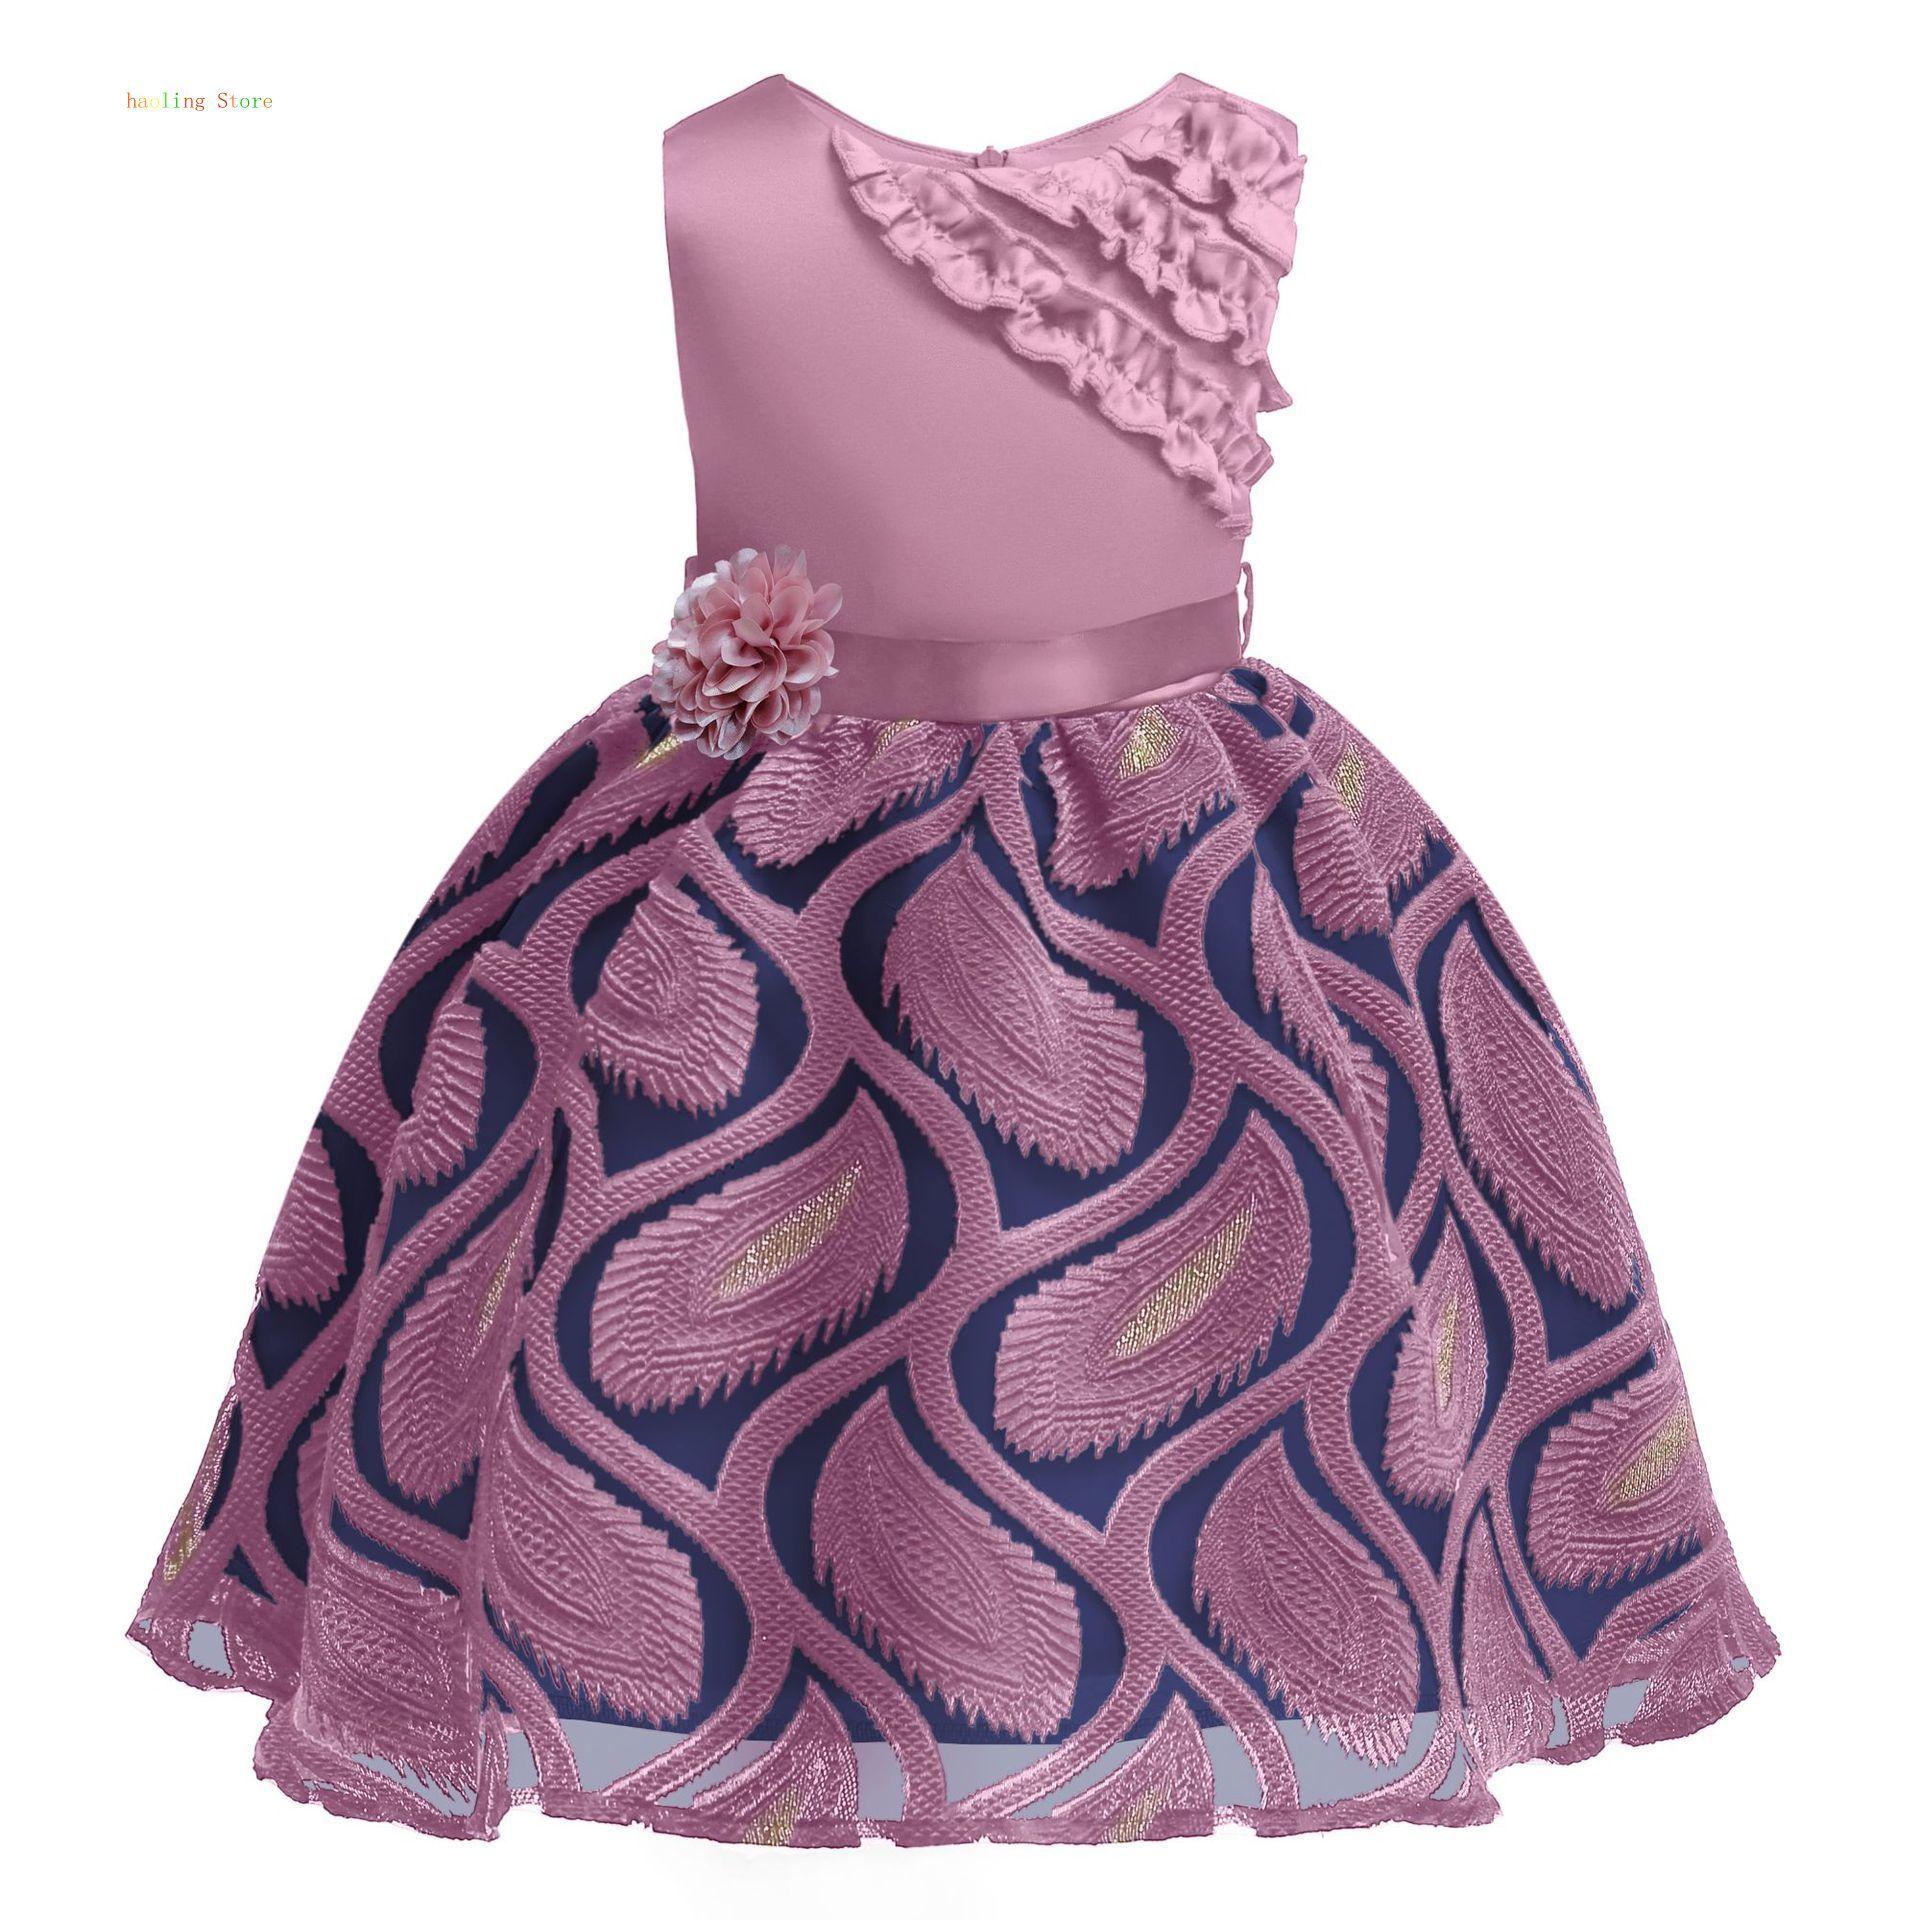 Kids Dresses For Girls Dress Elegant Sleeveless Flower Pattern Princess Girl Party Summer Clothing Free Shipping